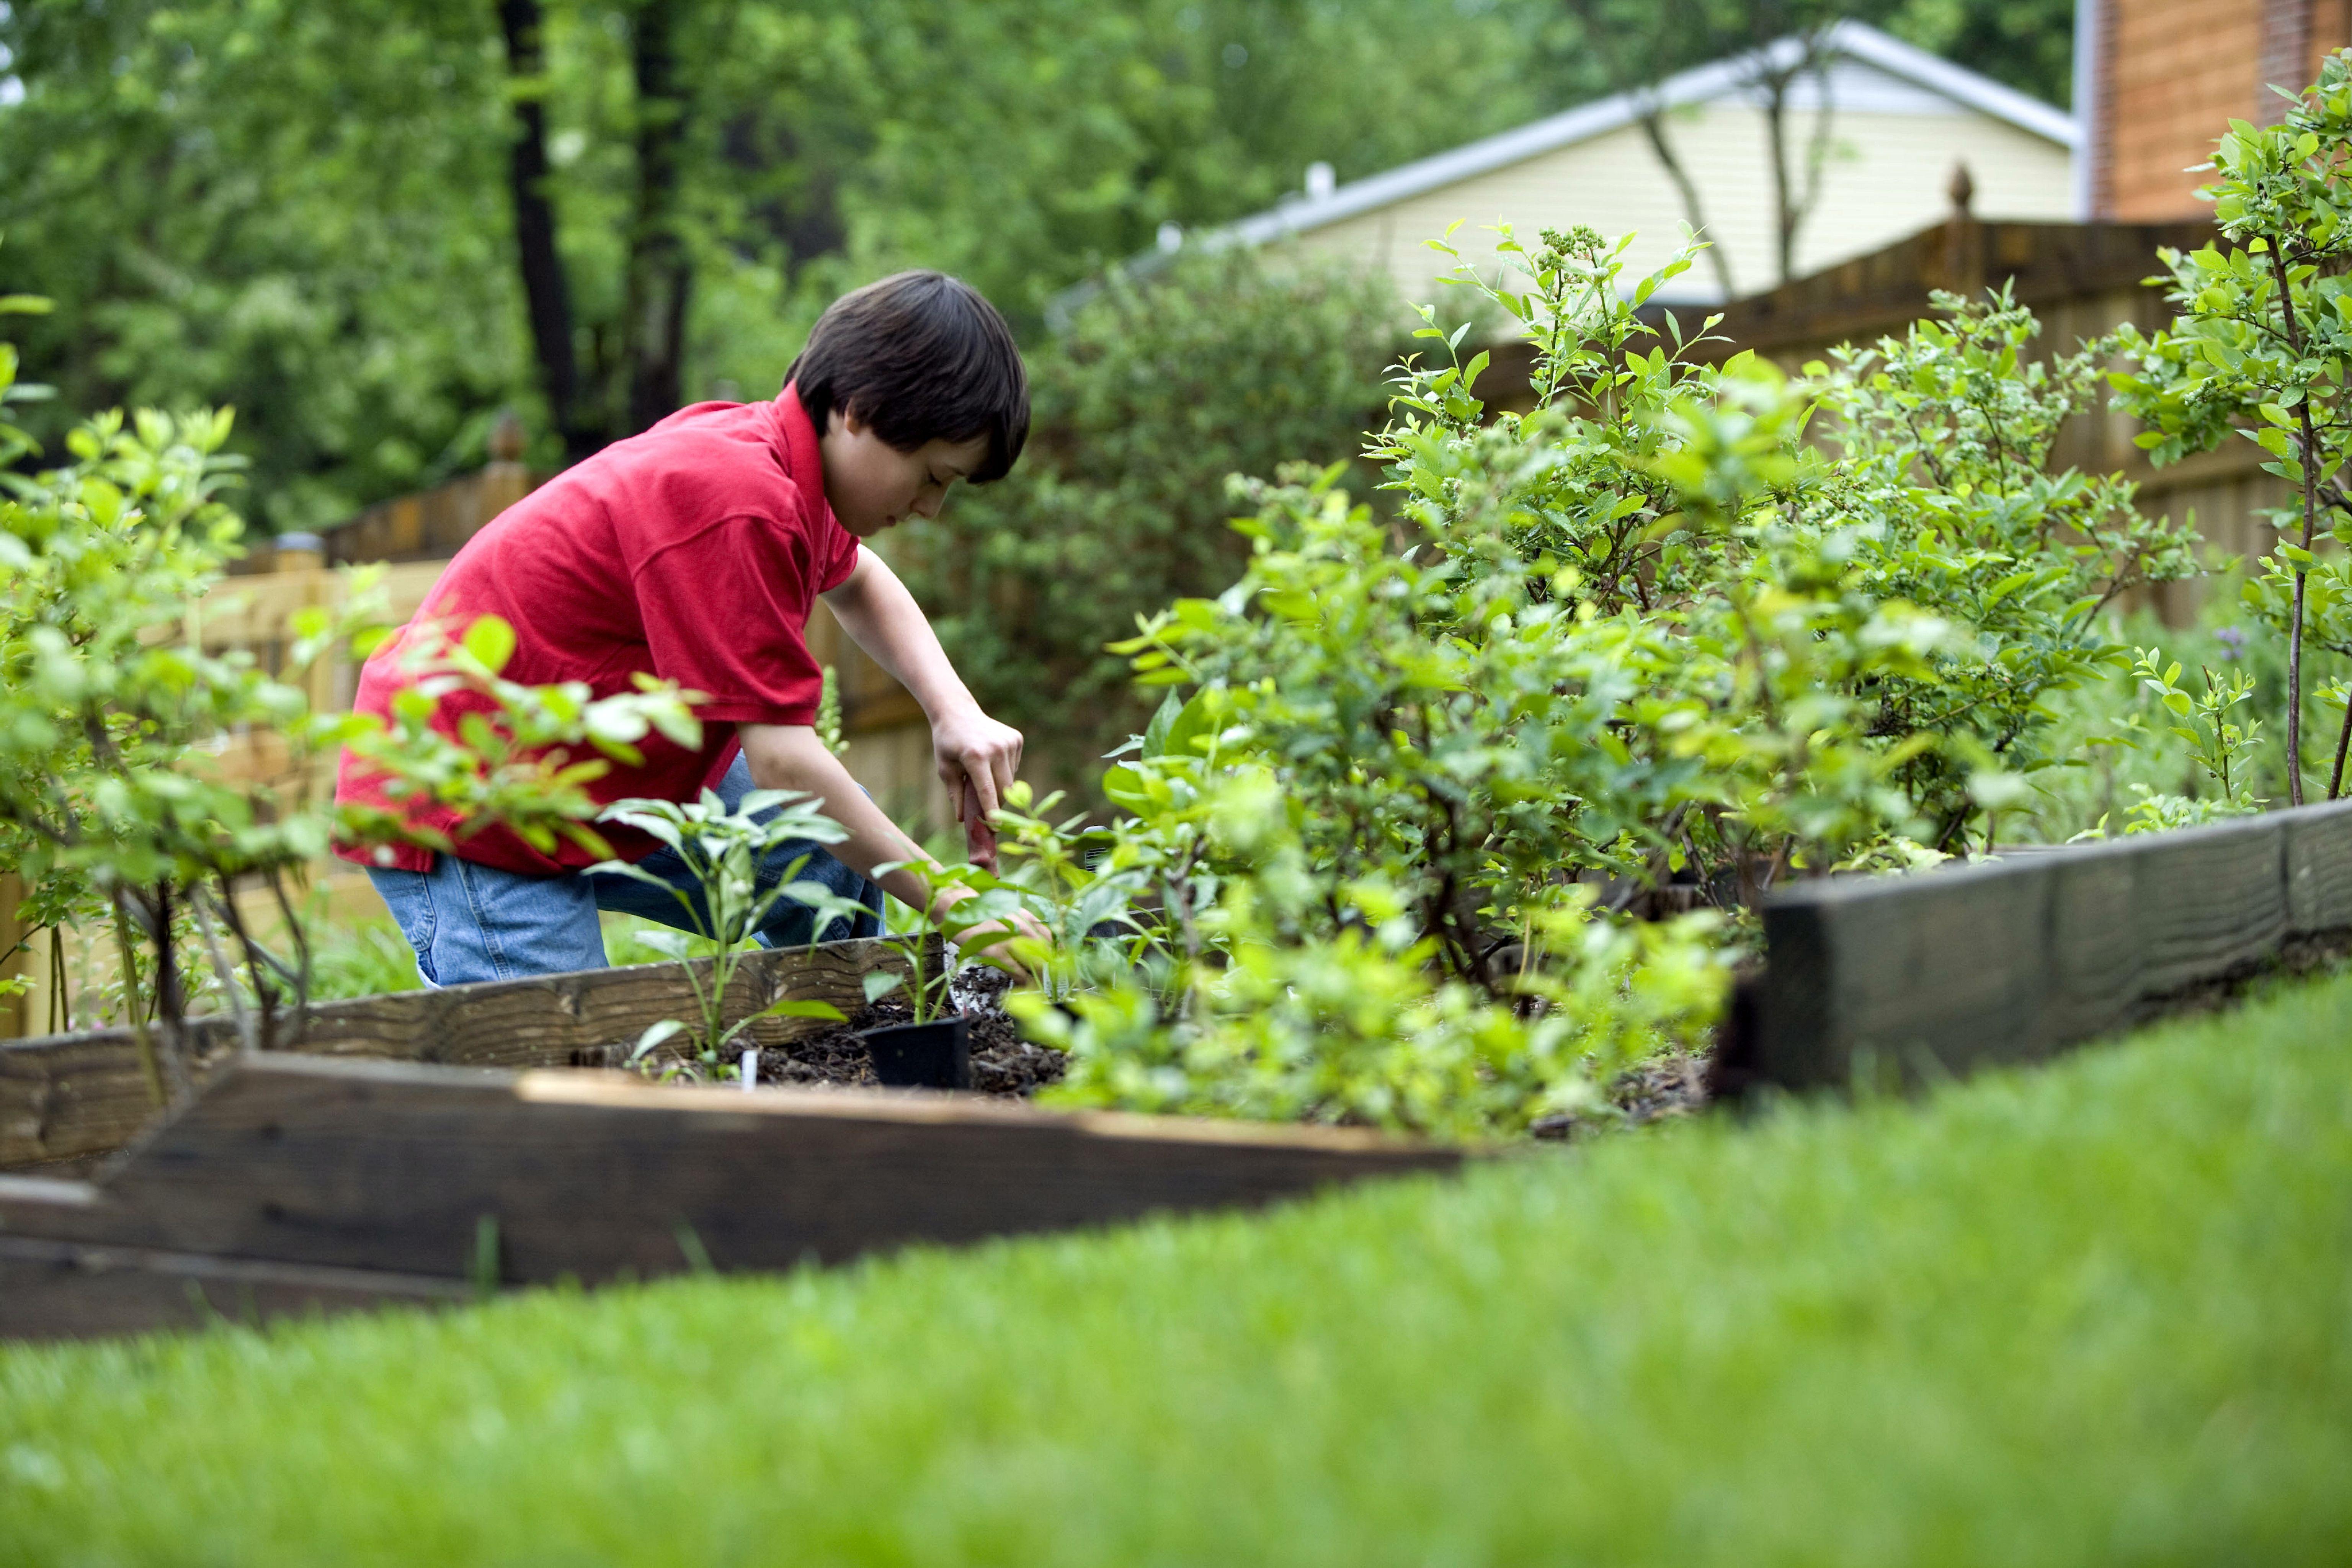 Image Libre Mignon Jeune Gar 231 On Jardinage Maison